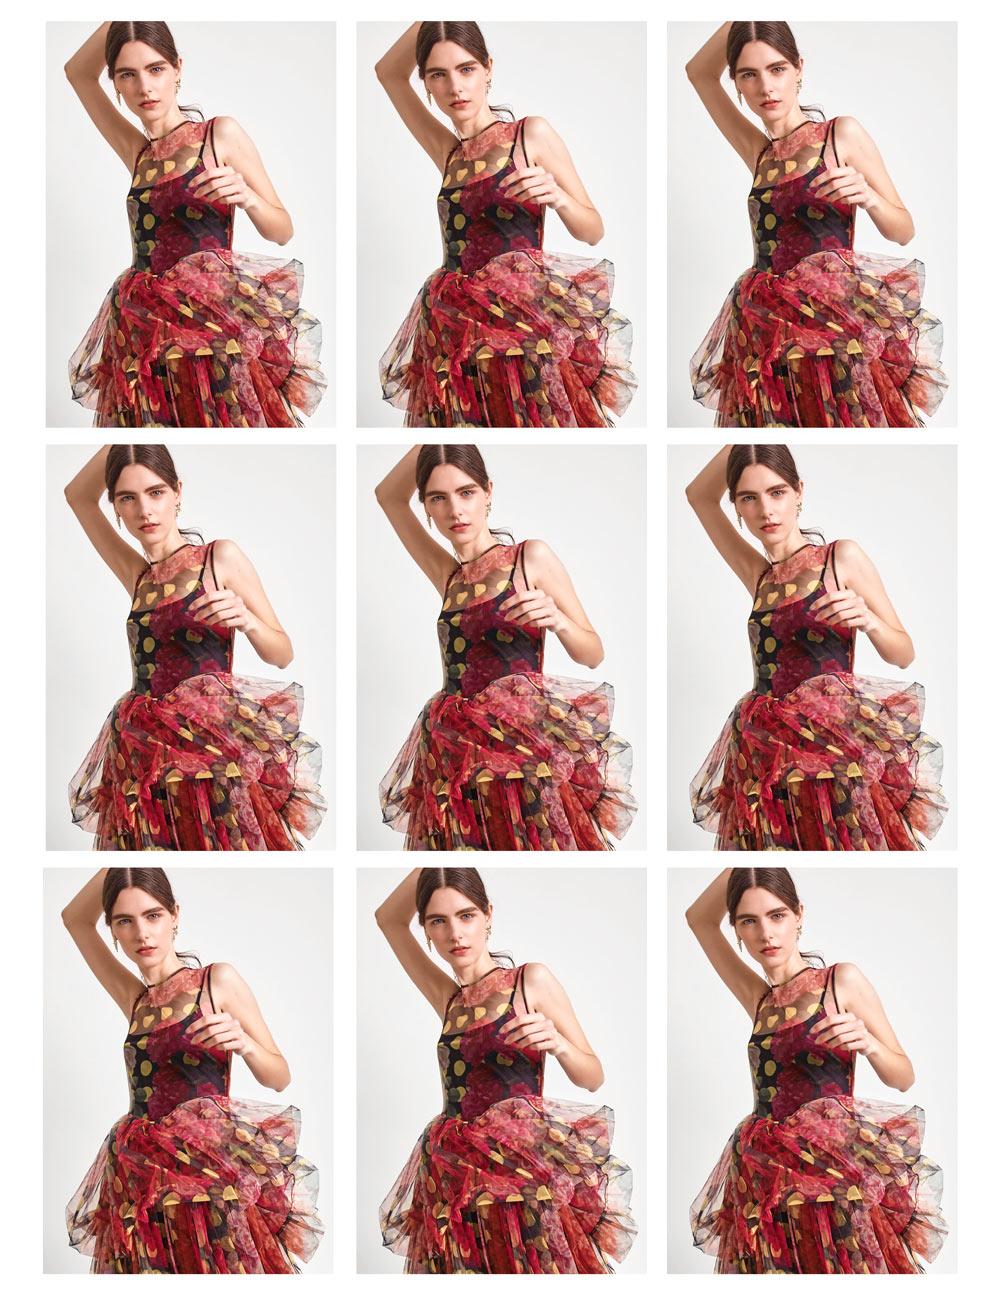 Maya Gunn – Next Models